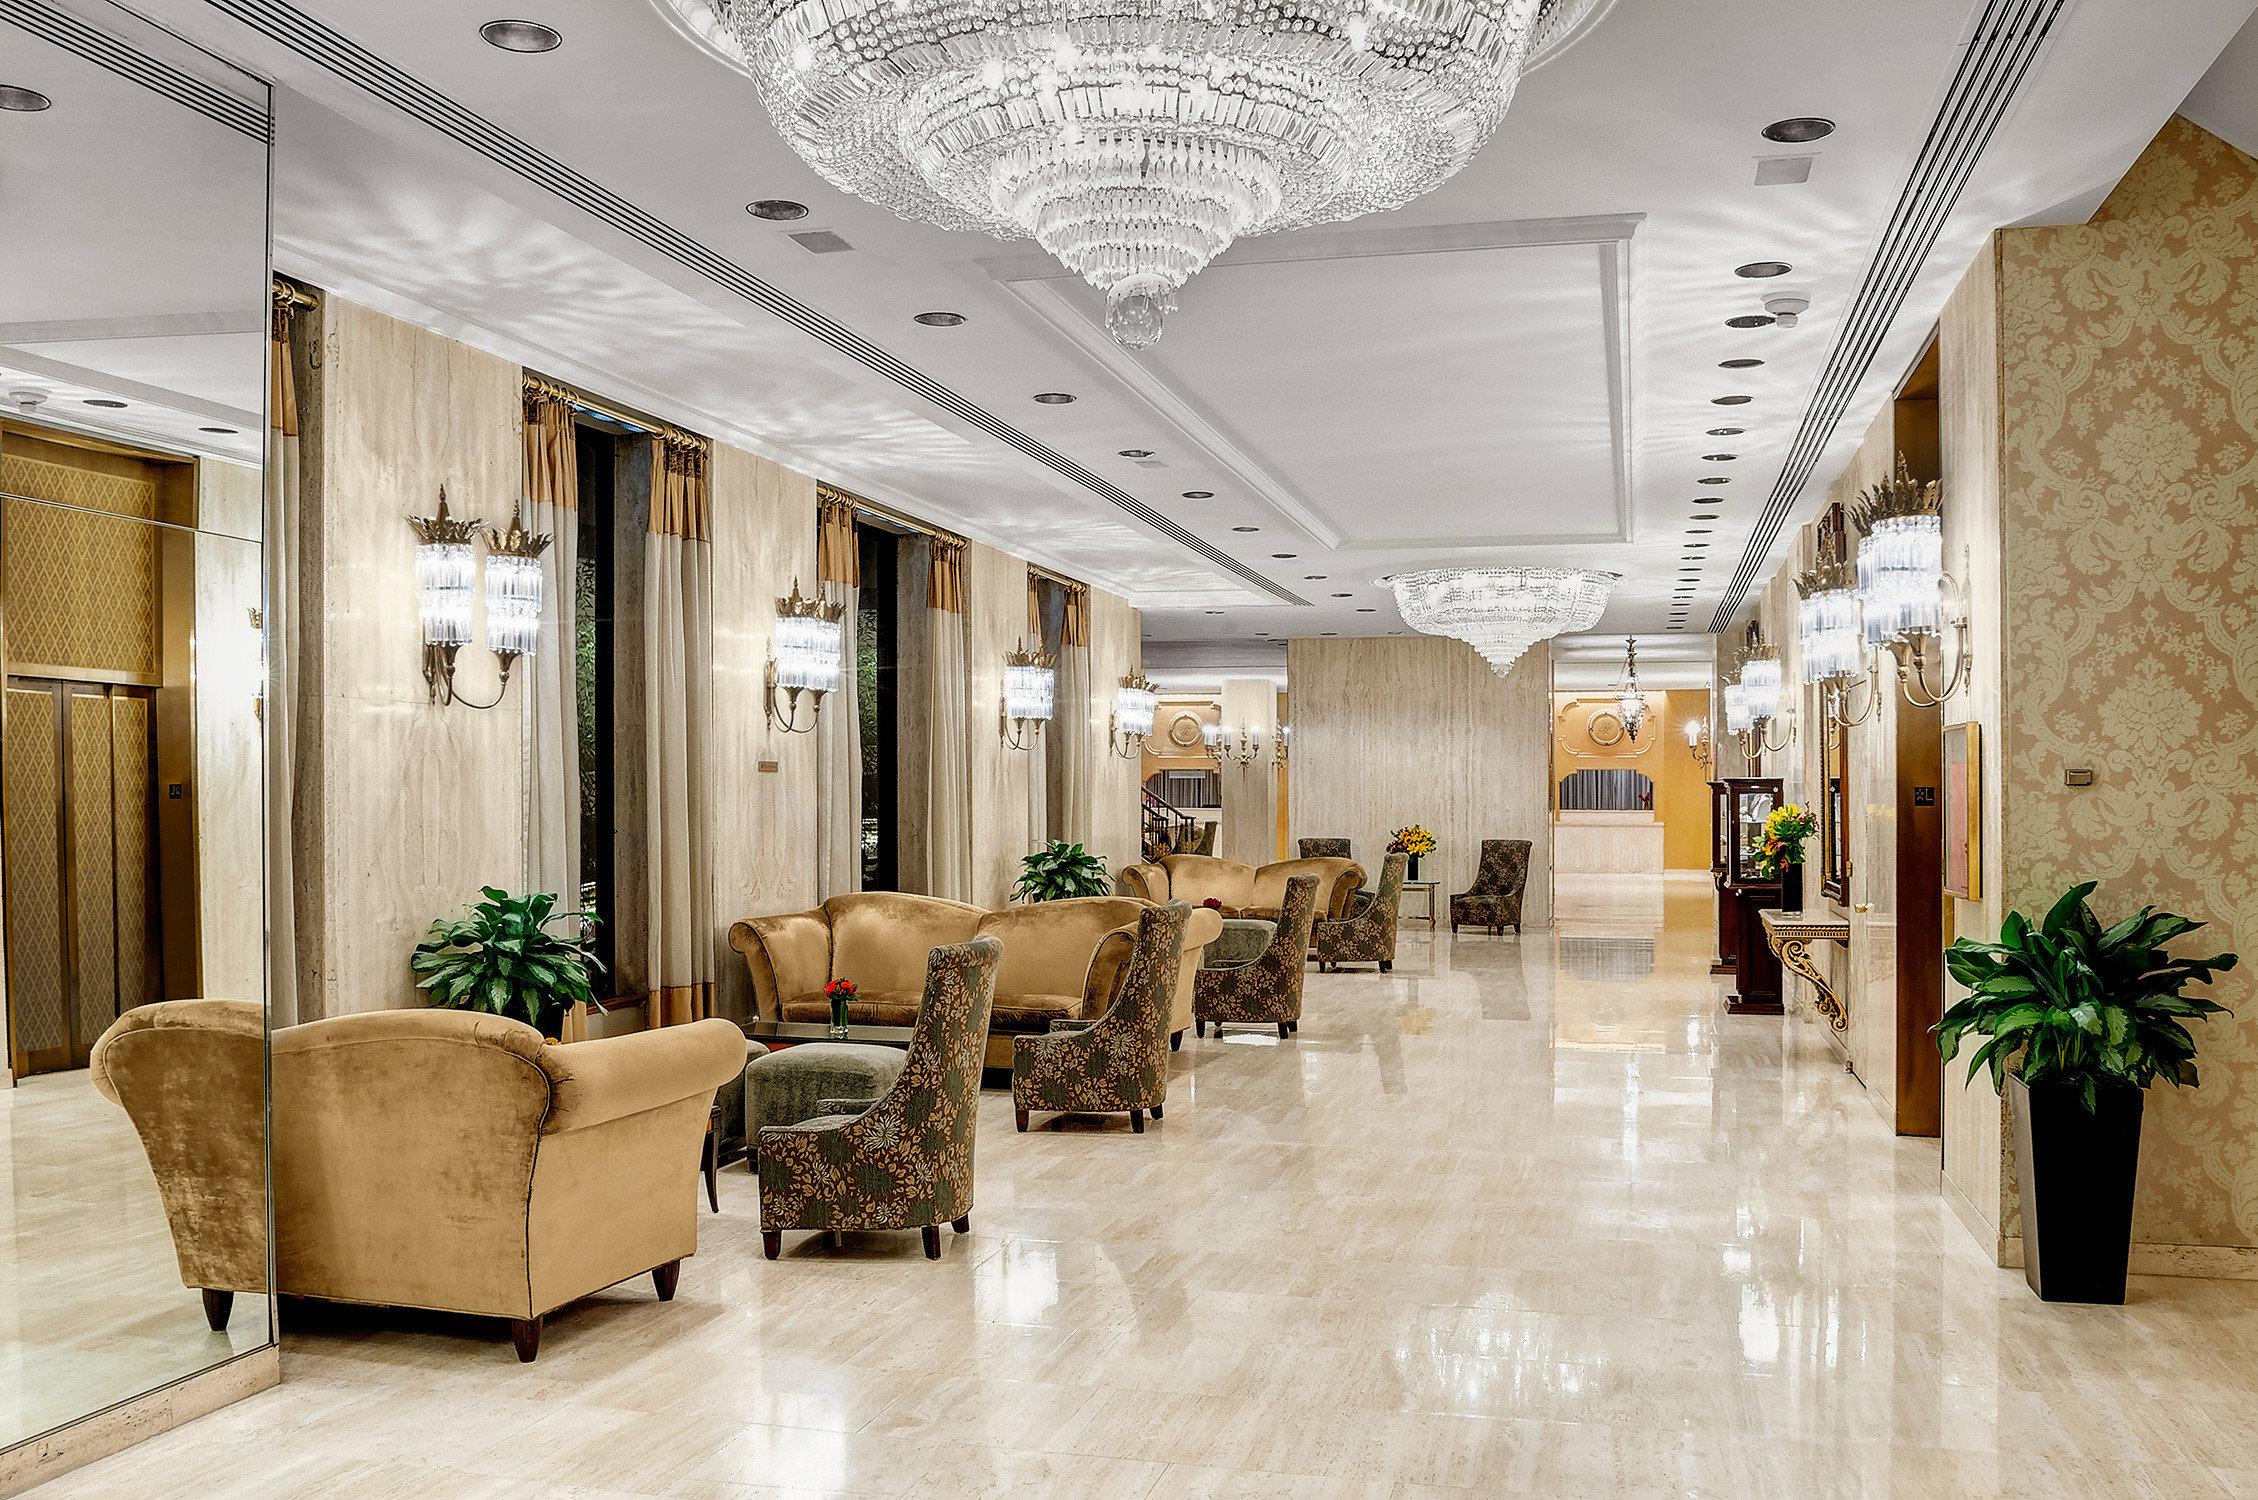 City Classic Elegant Lobby Lounge Parks lighting living room hall Boutique ballroom